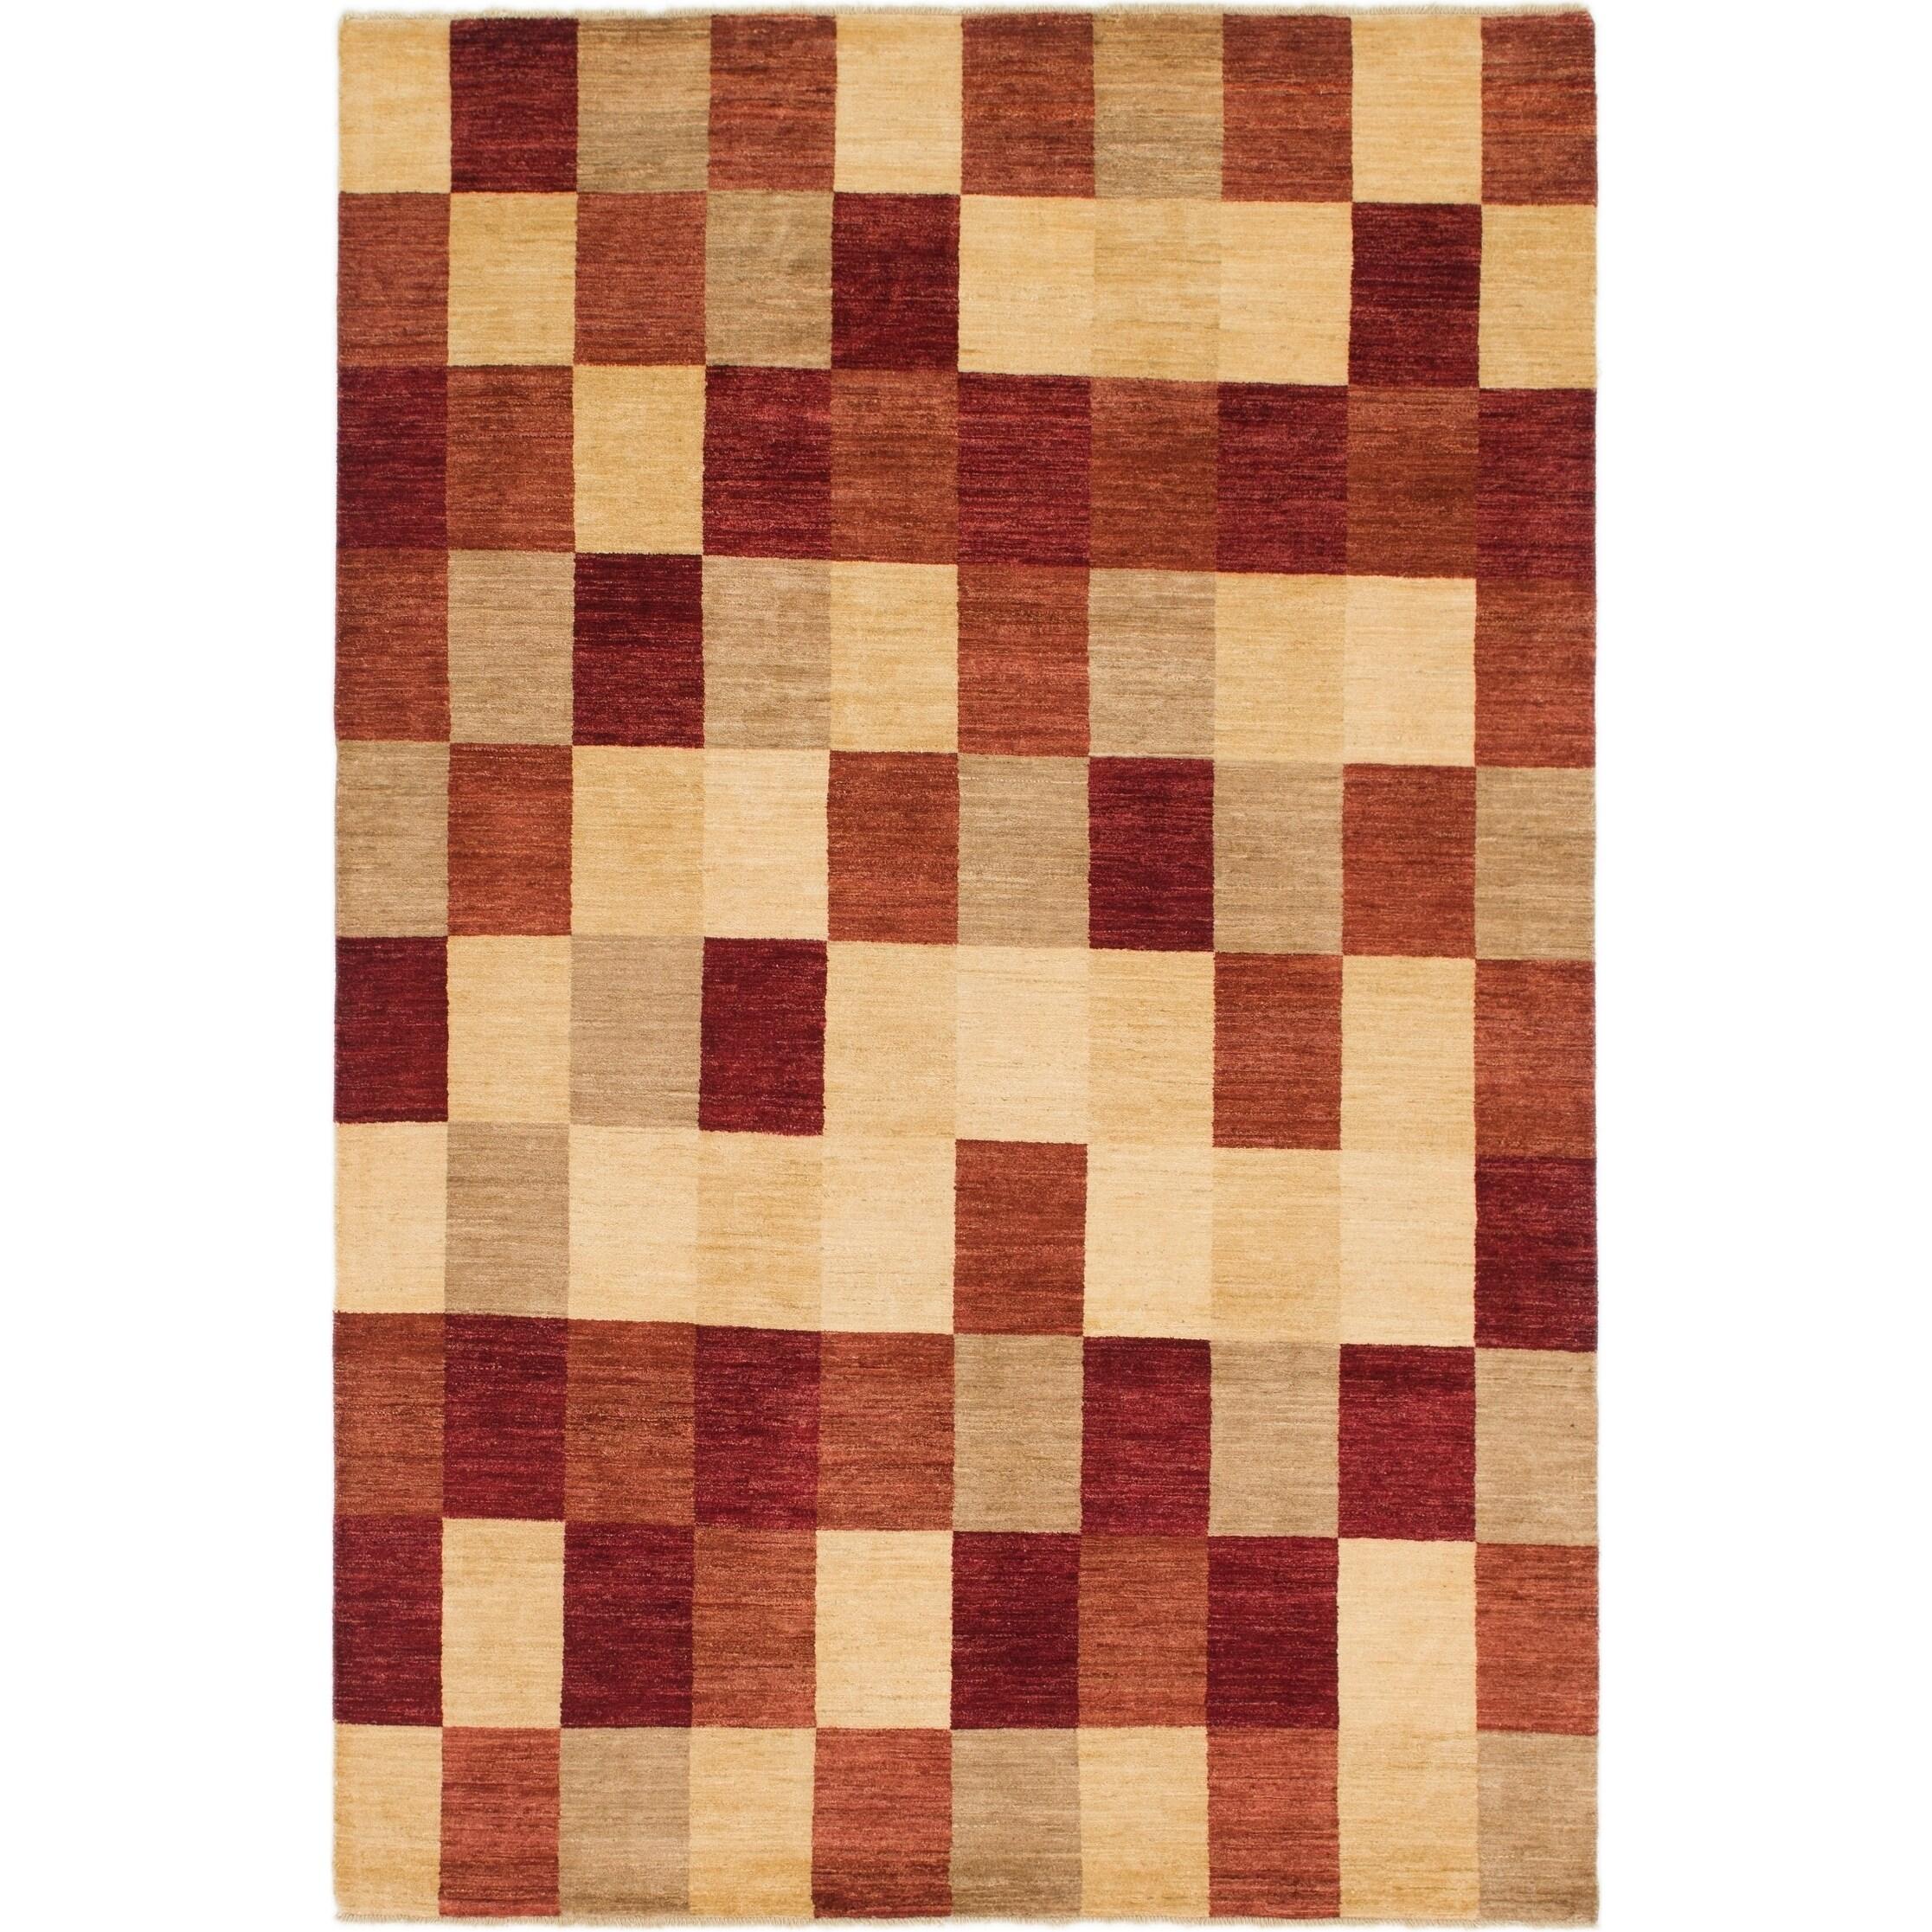 Hand Knotted Kashkuli Gabbeh Wool Area Rug - 6 7 x 10 (Multi - 6 7 x 10)